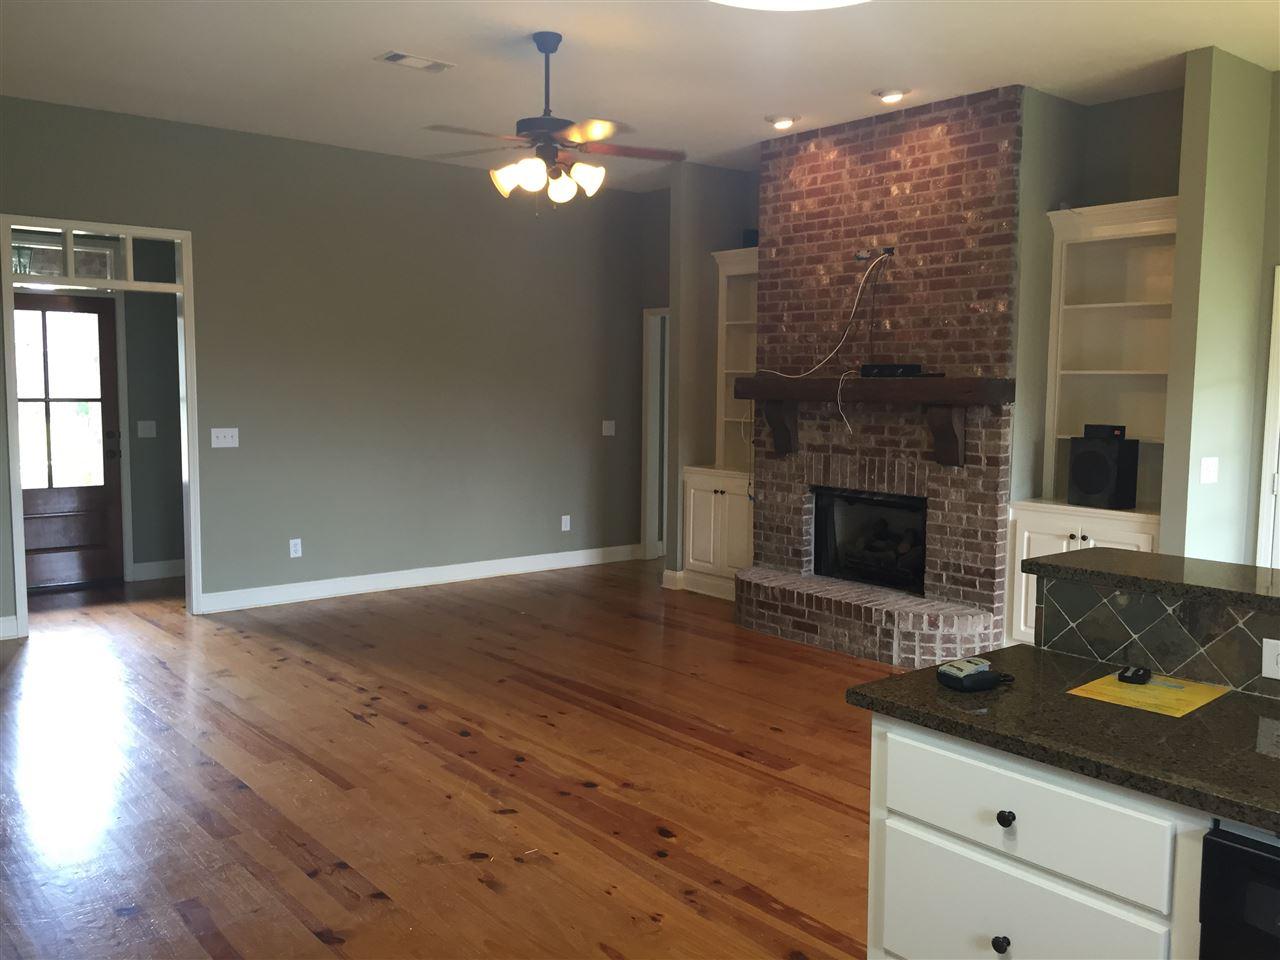 Rental Homes for Rent, ListingId:34531934, location: 107 COLES WAY Madison 39110